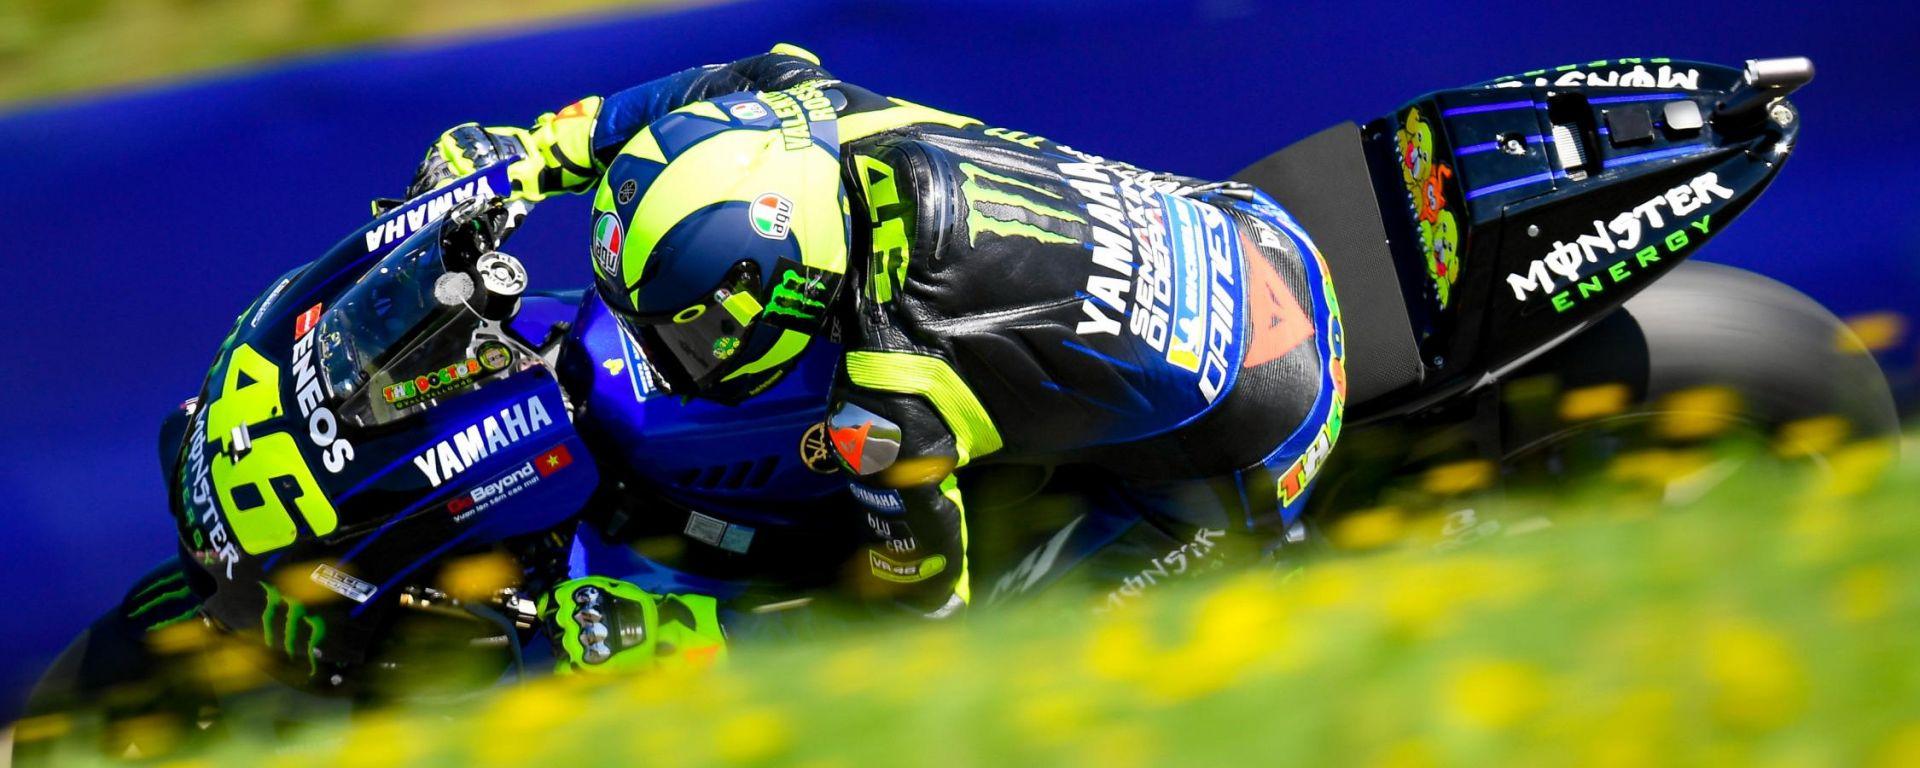 MotoGP Austria 2019, Valentino Rossi (Yamaha)